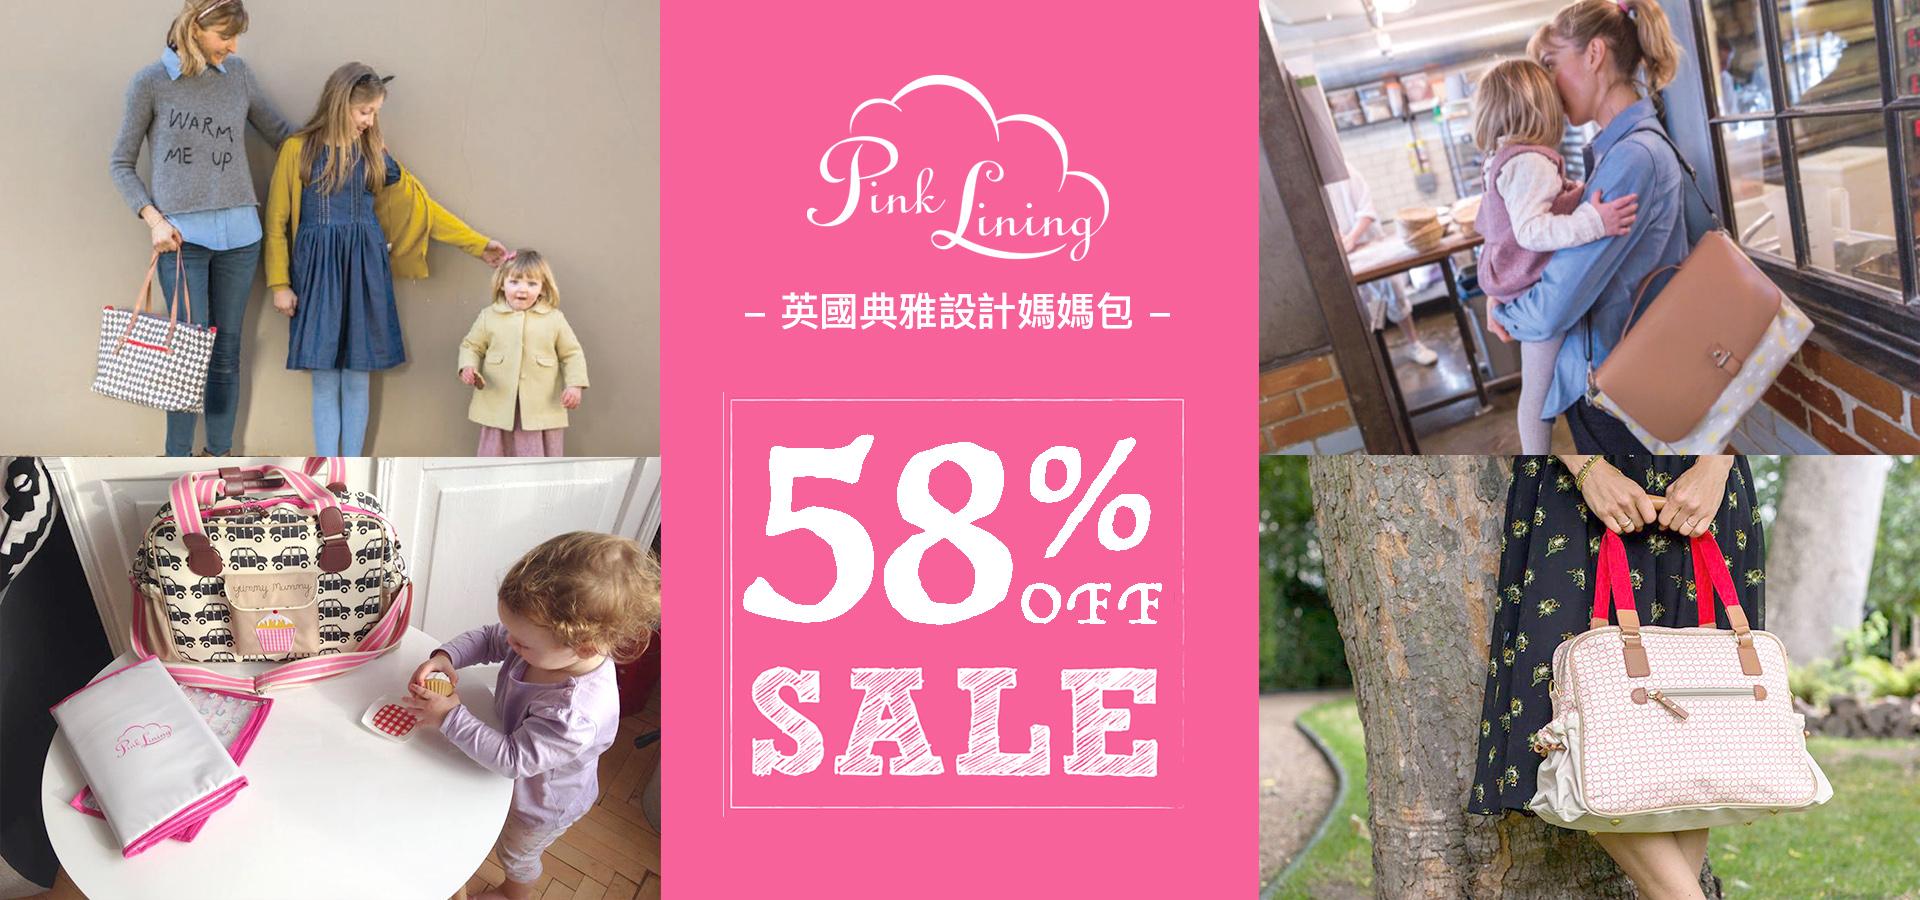 Pink Lining  英國媽媽包史上最強42折優惠